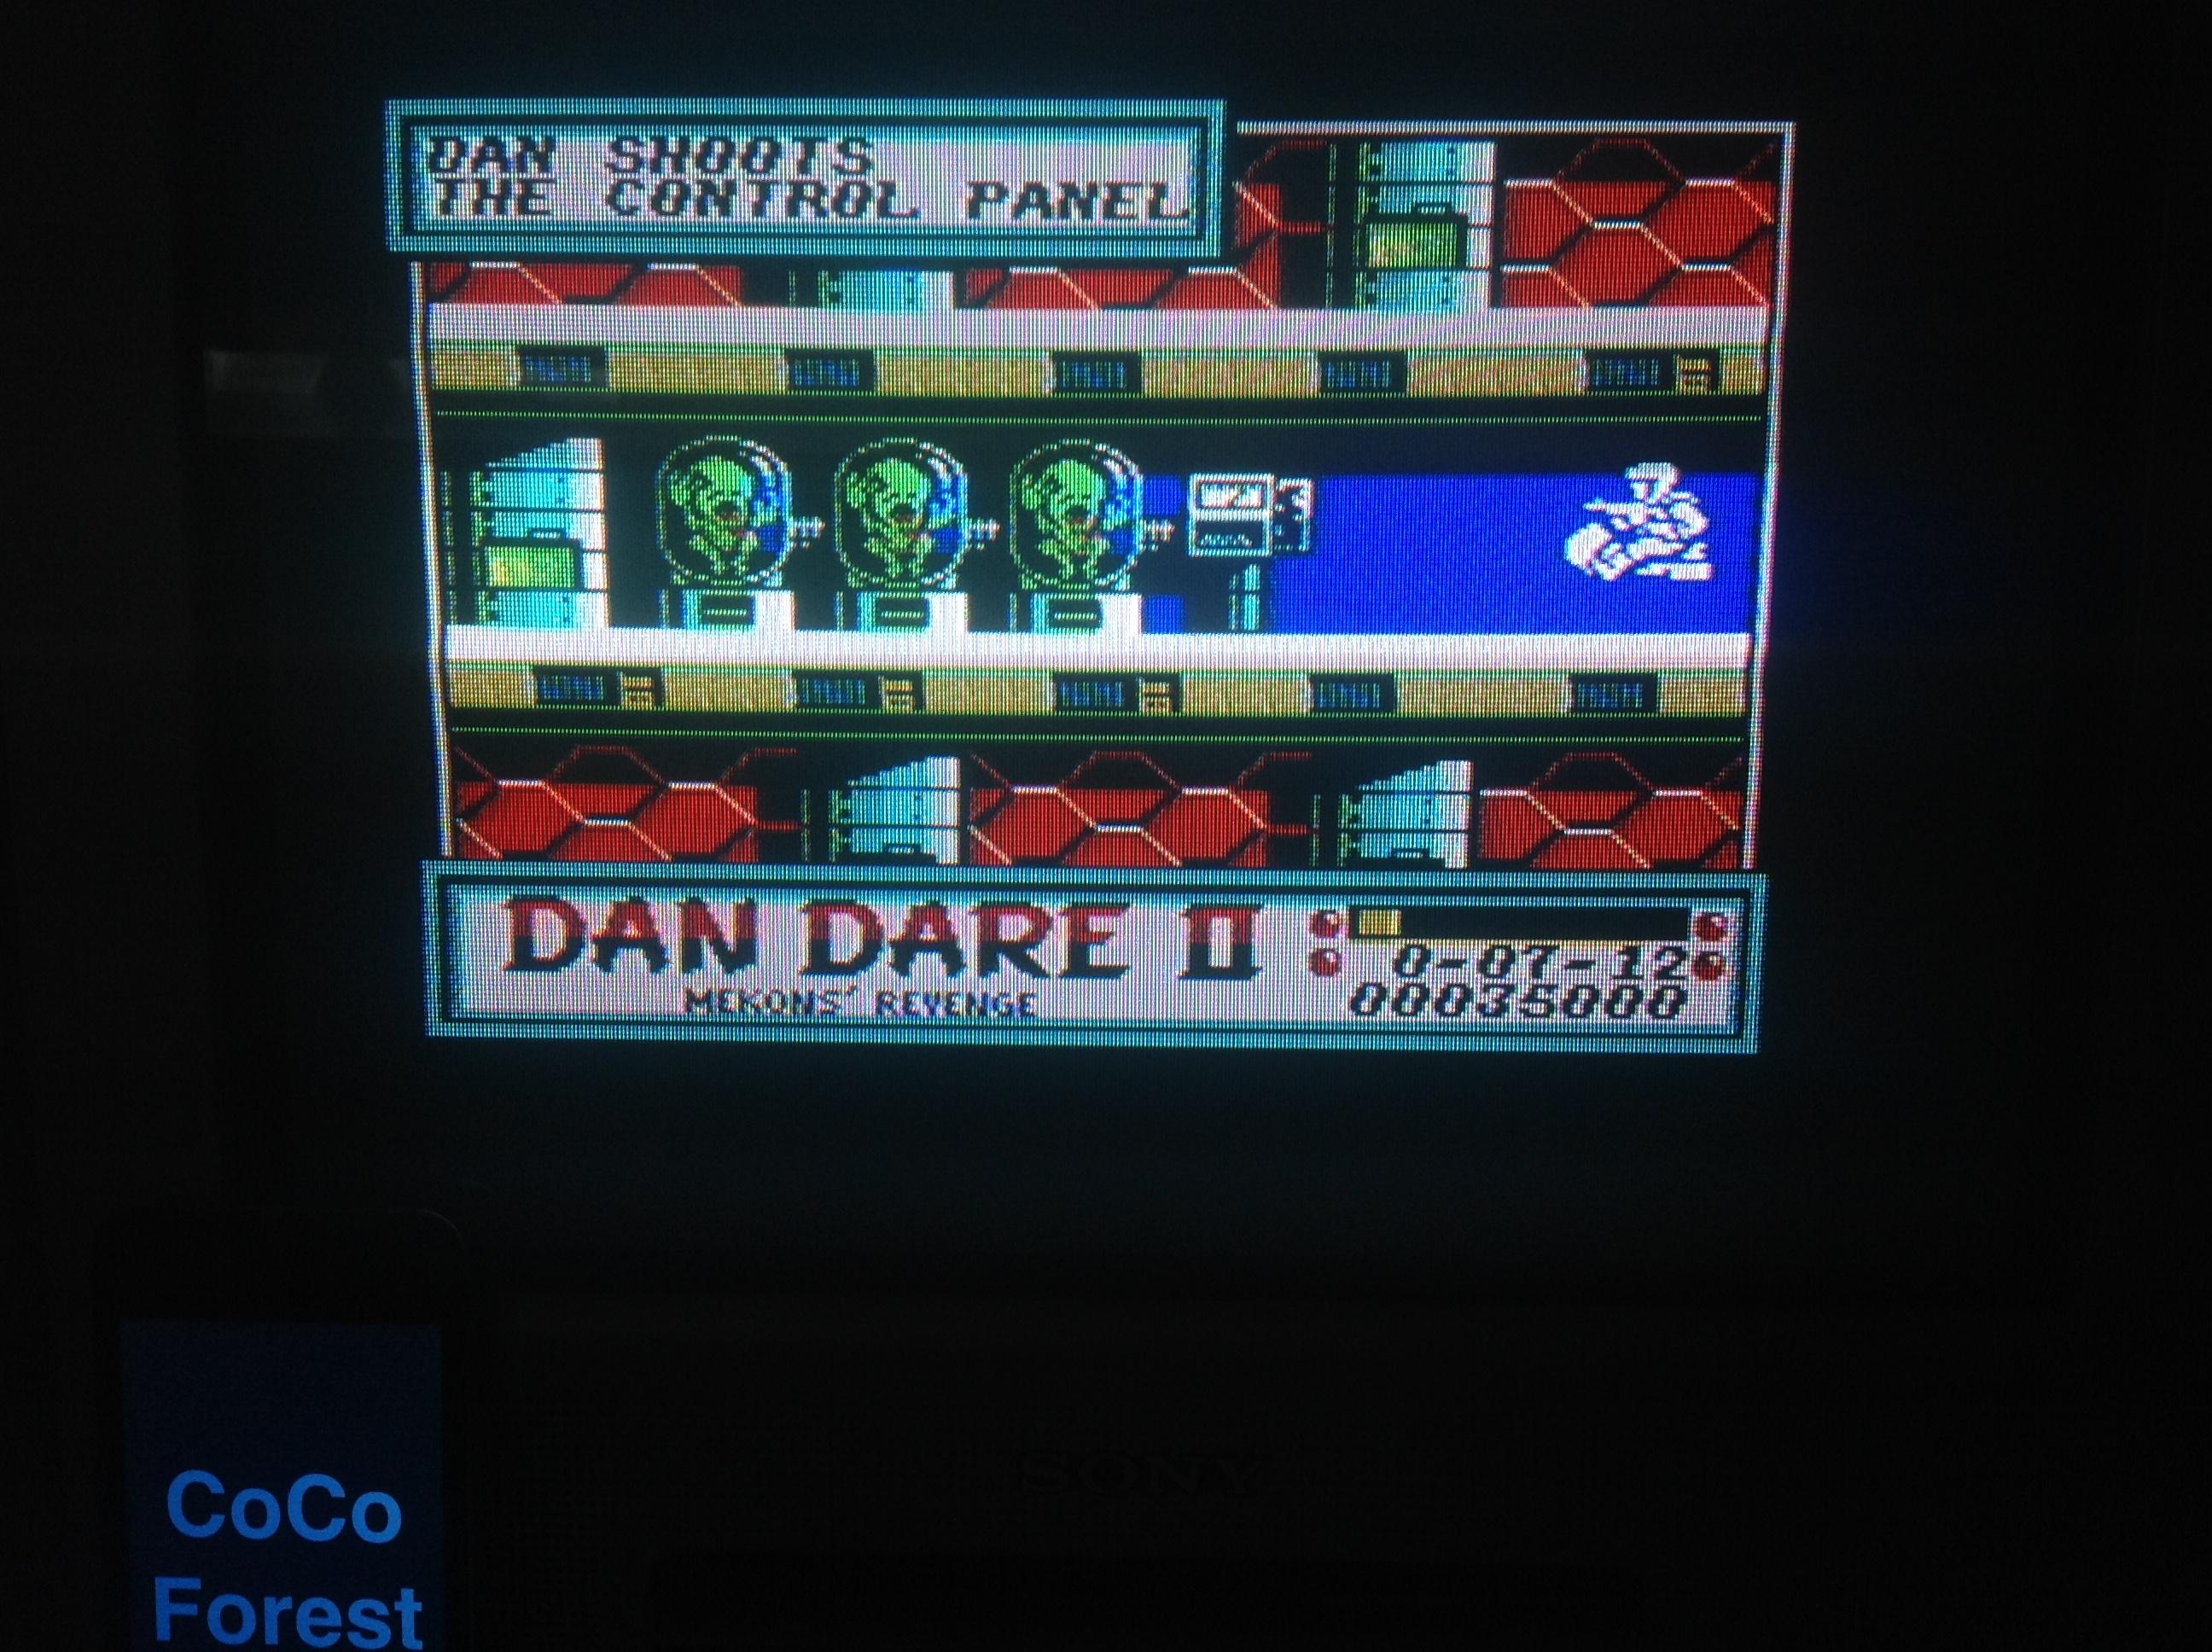 CoCoForest: Dan Dare II: Mekon